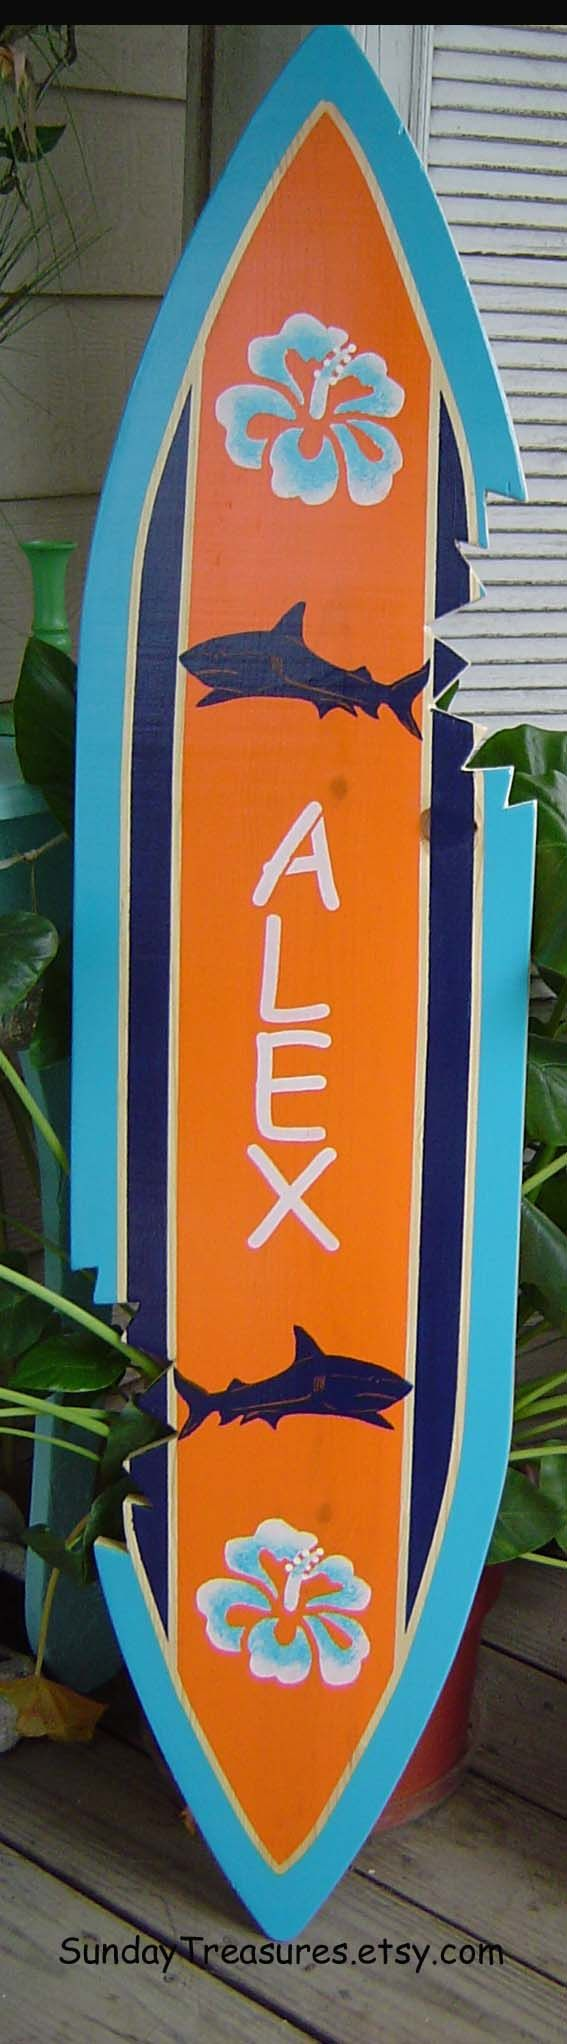 4FT SHARK SURFBOARD Wall art Beach Sign with Shark Bites.  Navy Turquoise Orange. Hawaiian Surf Wall Decor. Personalized 150 Designs 3 Sizes. $99.00, via Etsy.